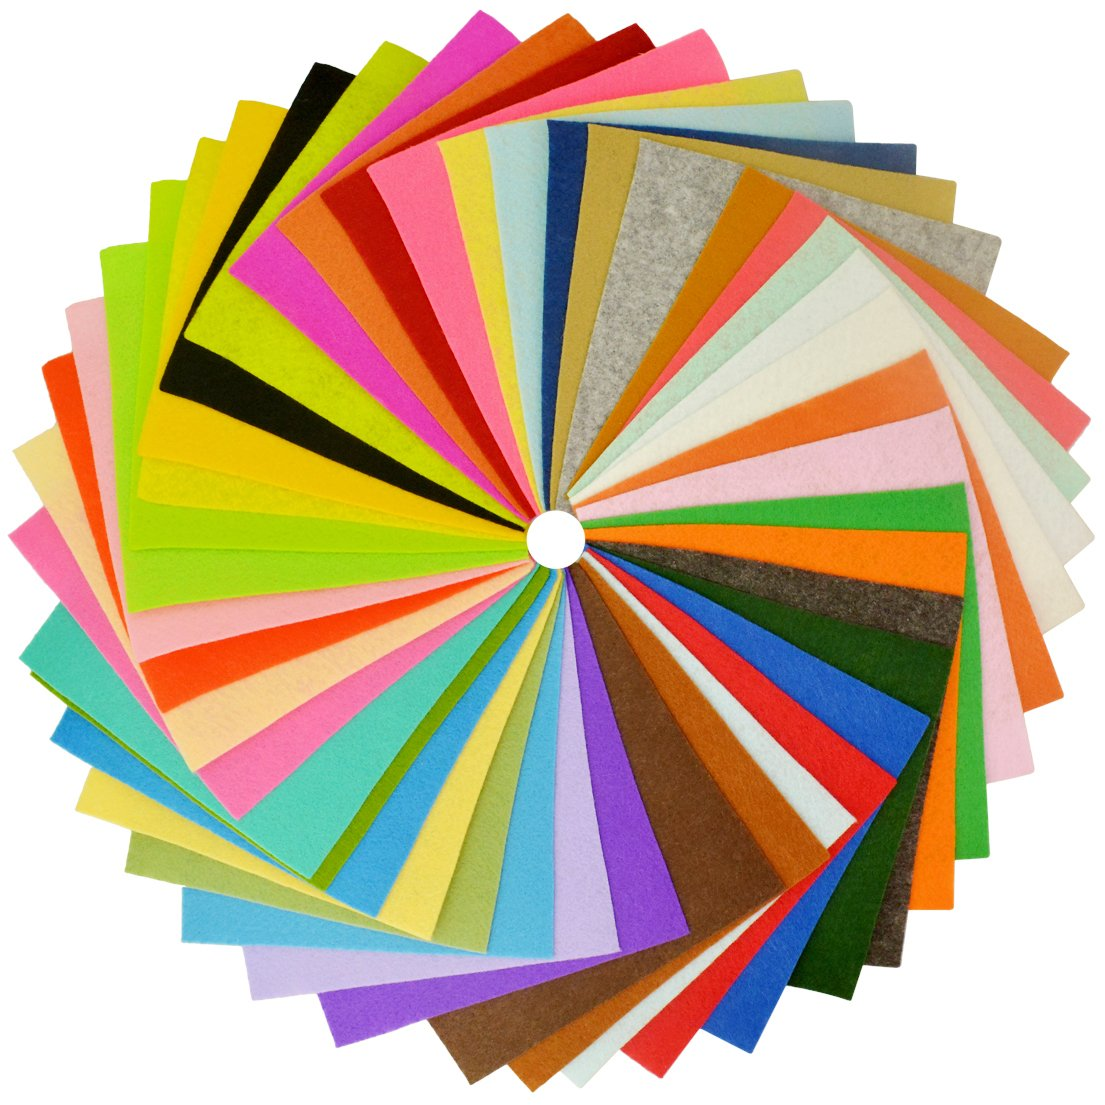 42pcs Felt Fabric, Jmkcoz Crafts DIY Felt Nonwoven Fabric Sheet for Art Craft 42 Colors 15 x 15cm DIY fabric